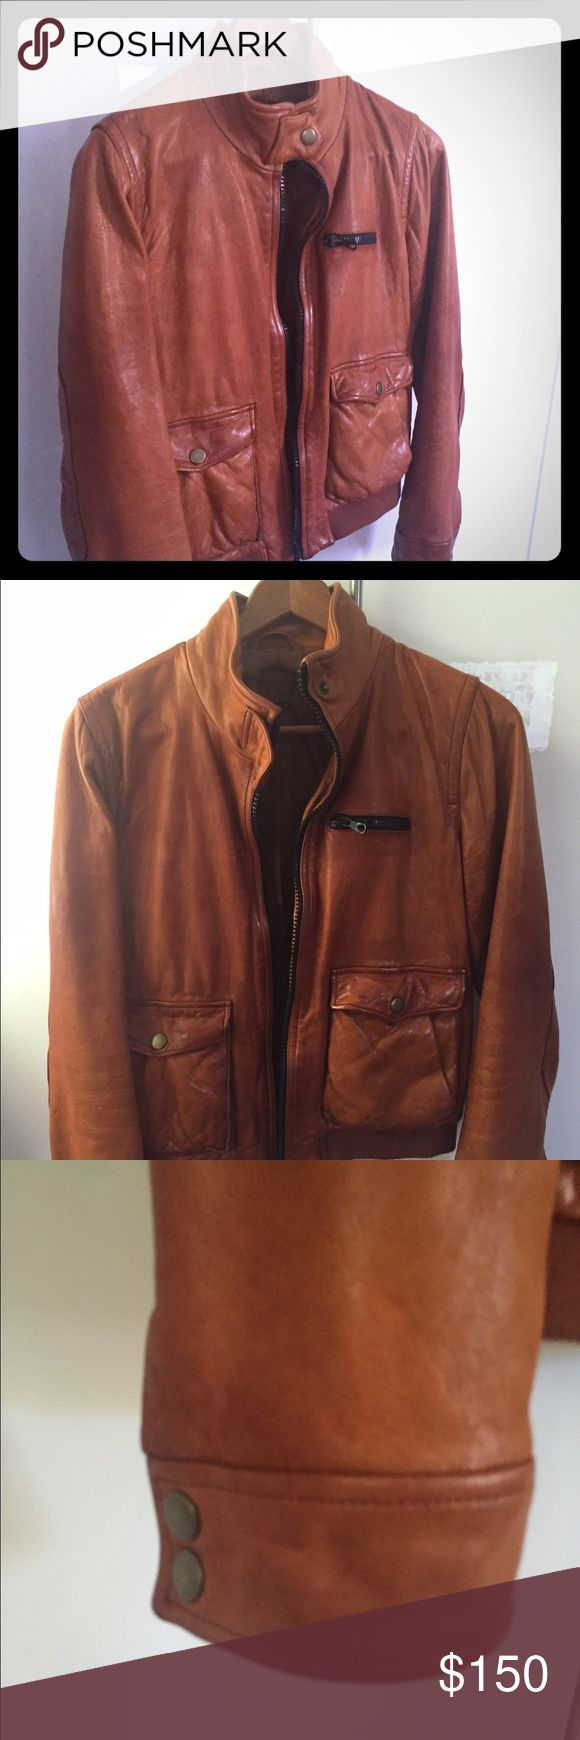 Leather Bomber Jacket Leather bomber jacket. Like new! GAP Jackets & Coats